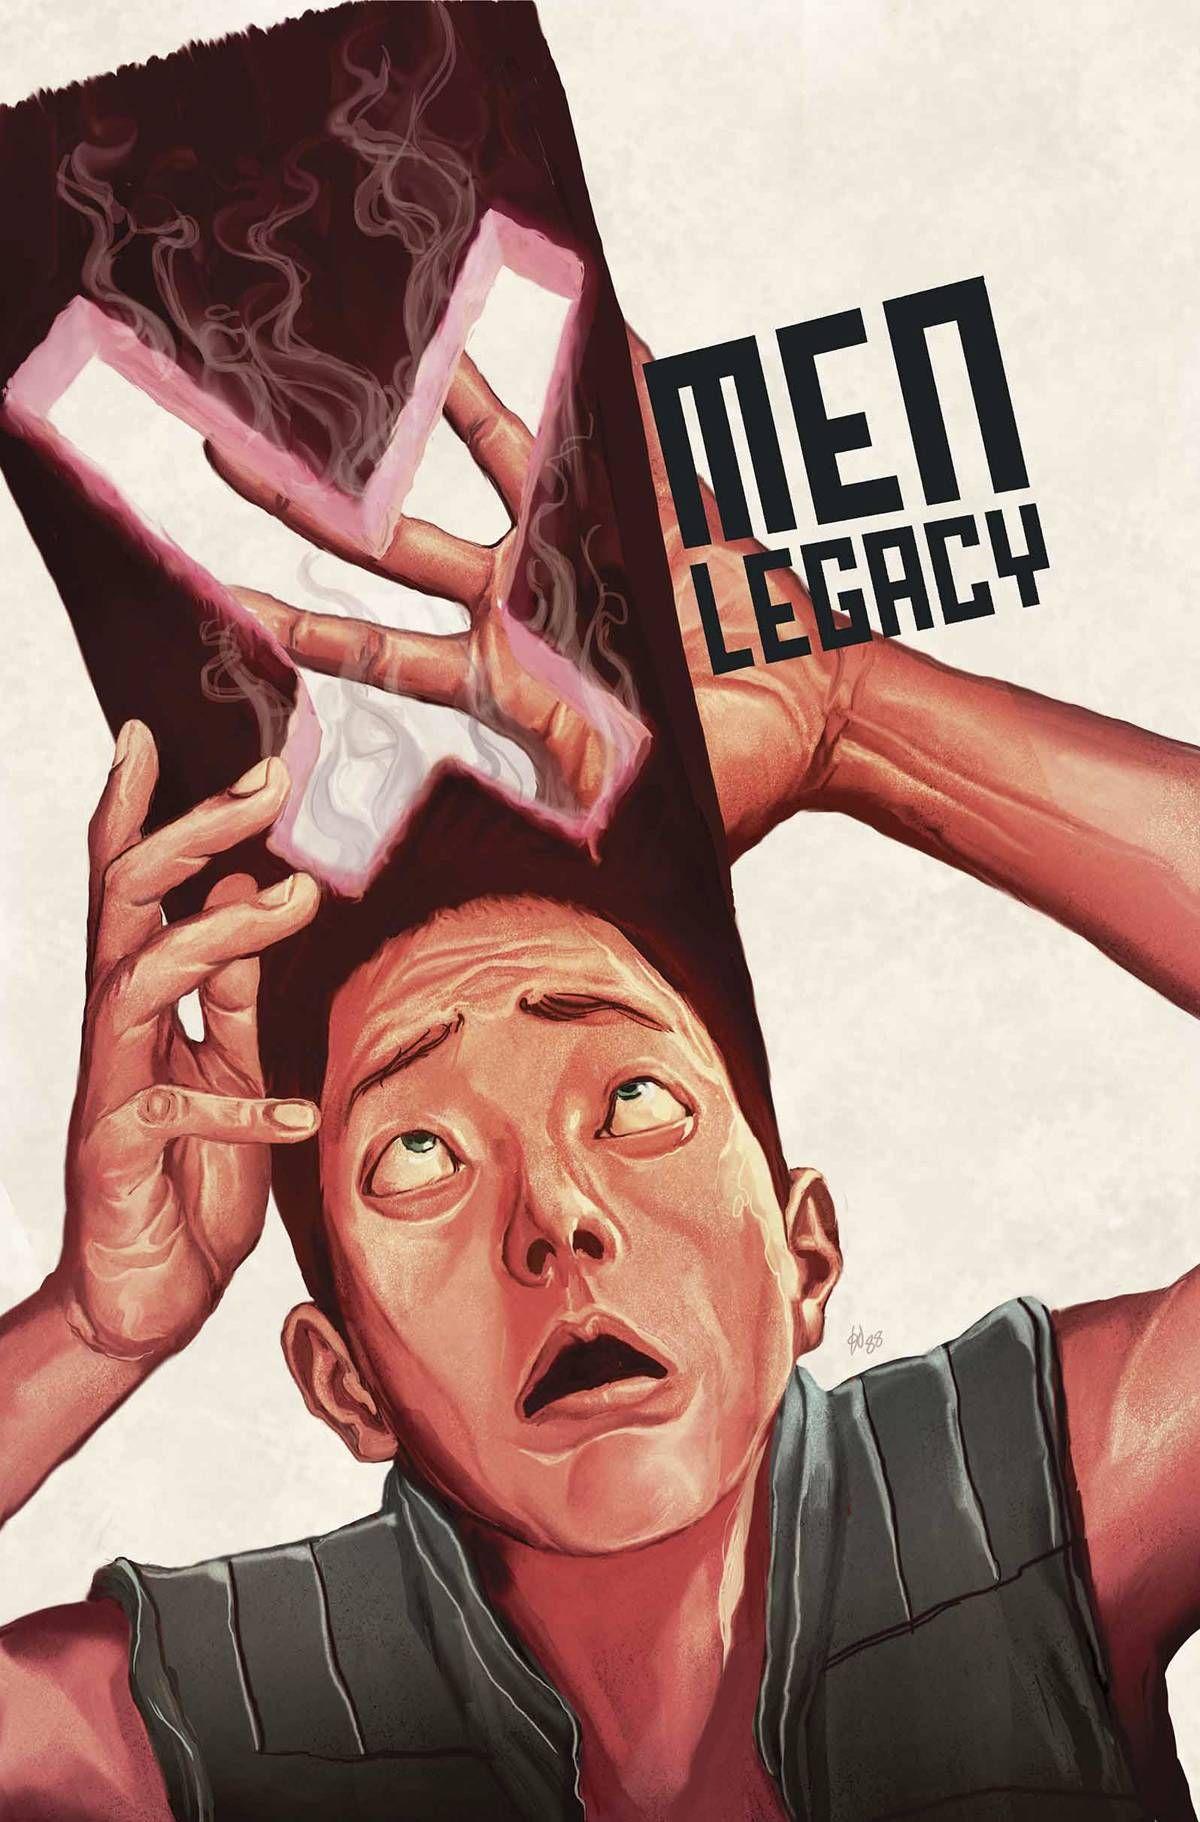 X Men Legacy Vol 2 16 Virgin Cover Marvel Xmenlegacy Cover Artist Mike Del Mundo On Sale 9 4 2013 X Men Marvel Comics Comic Poster